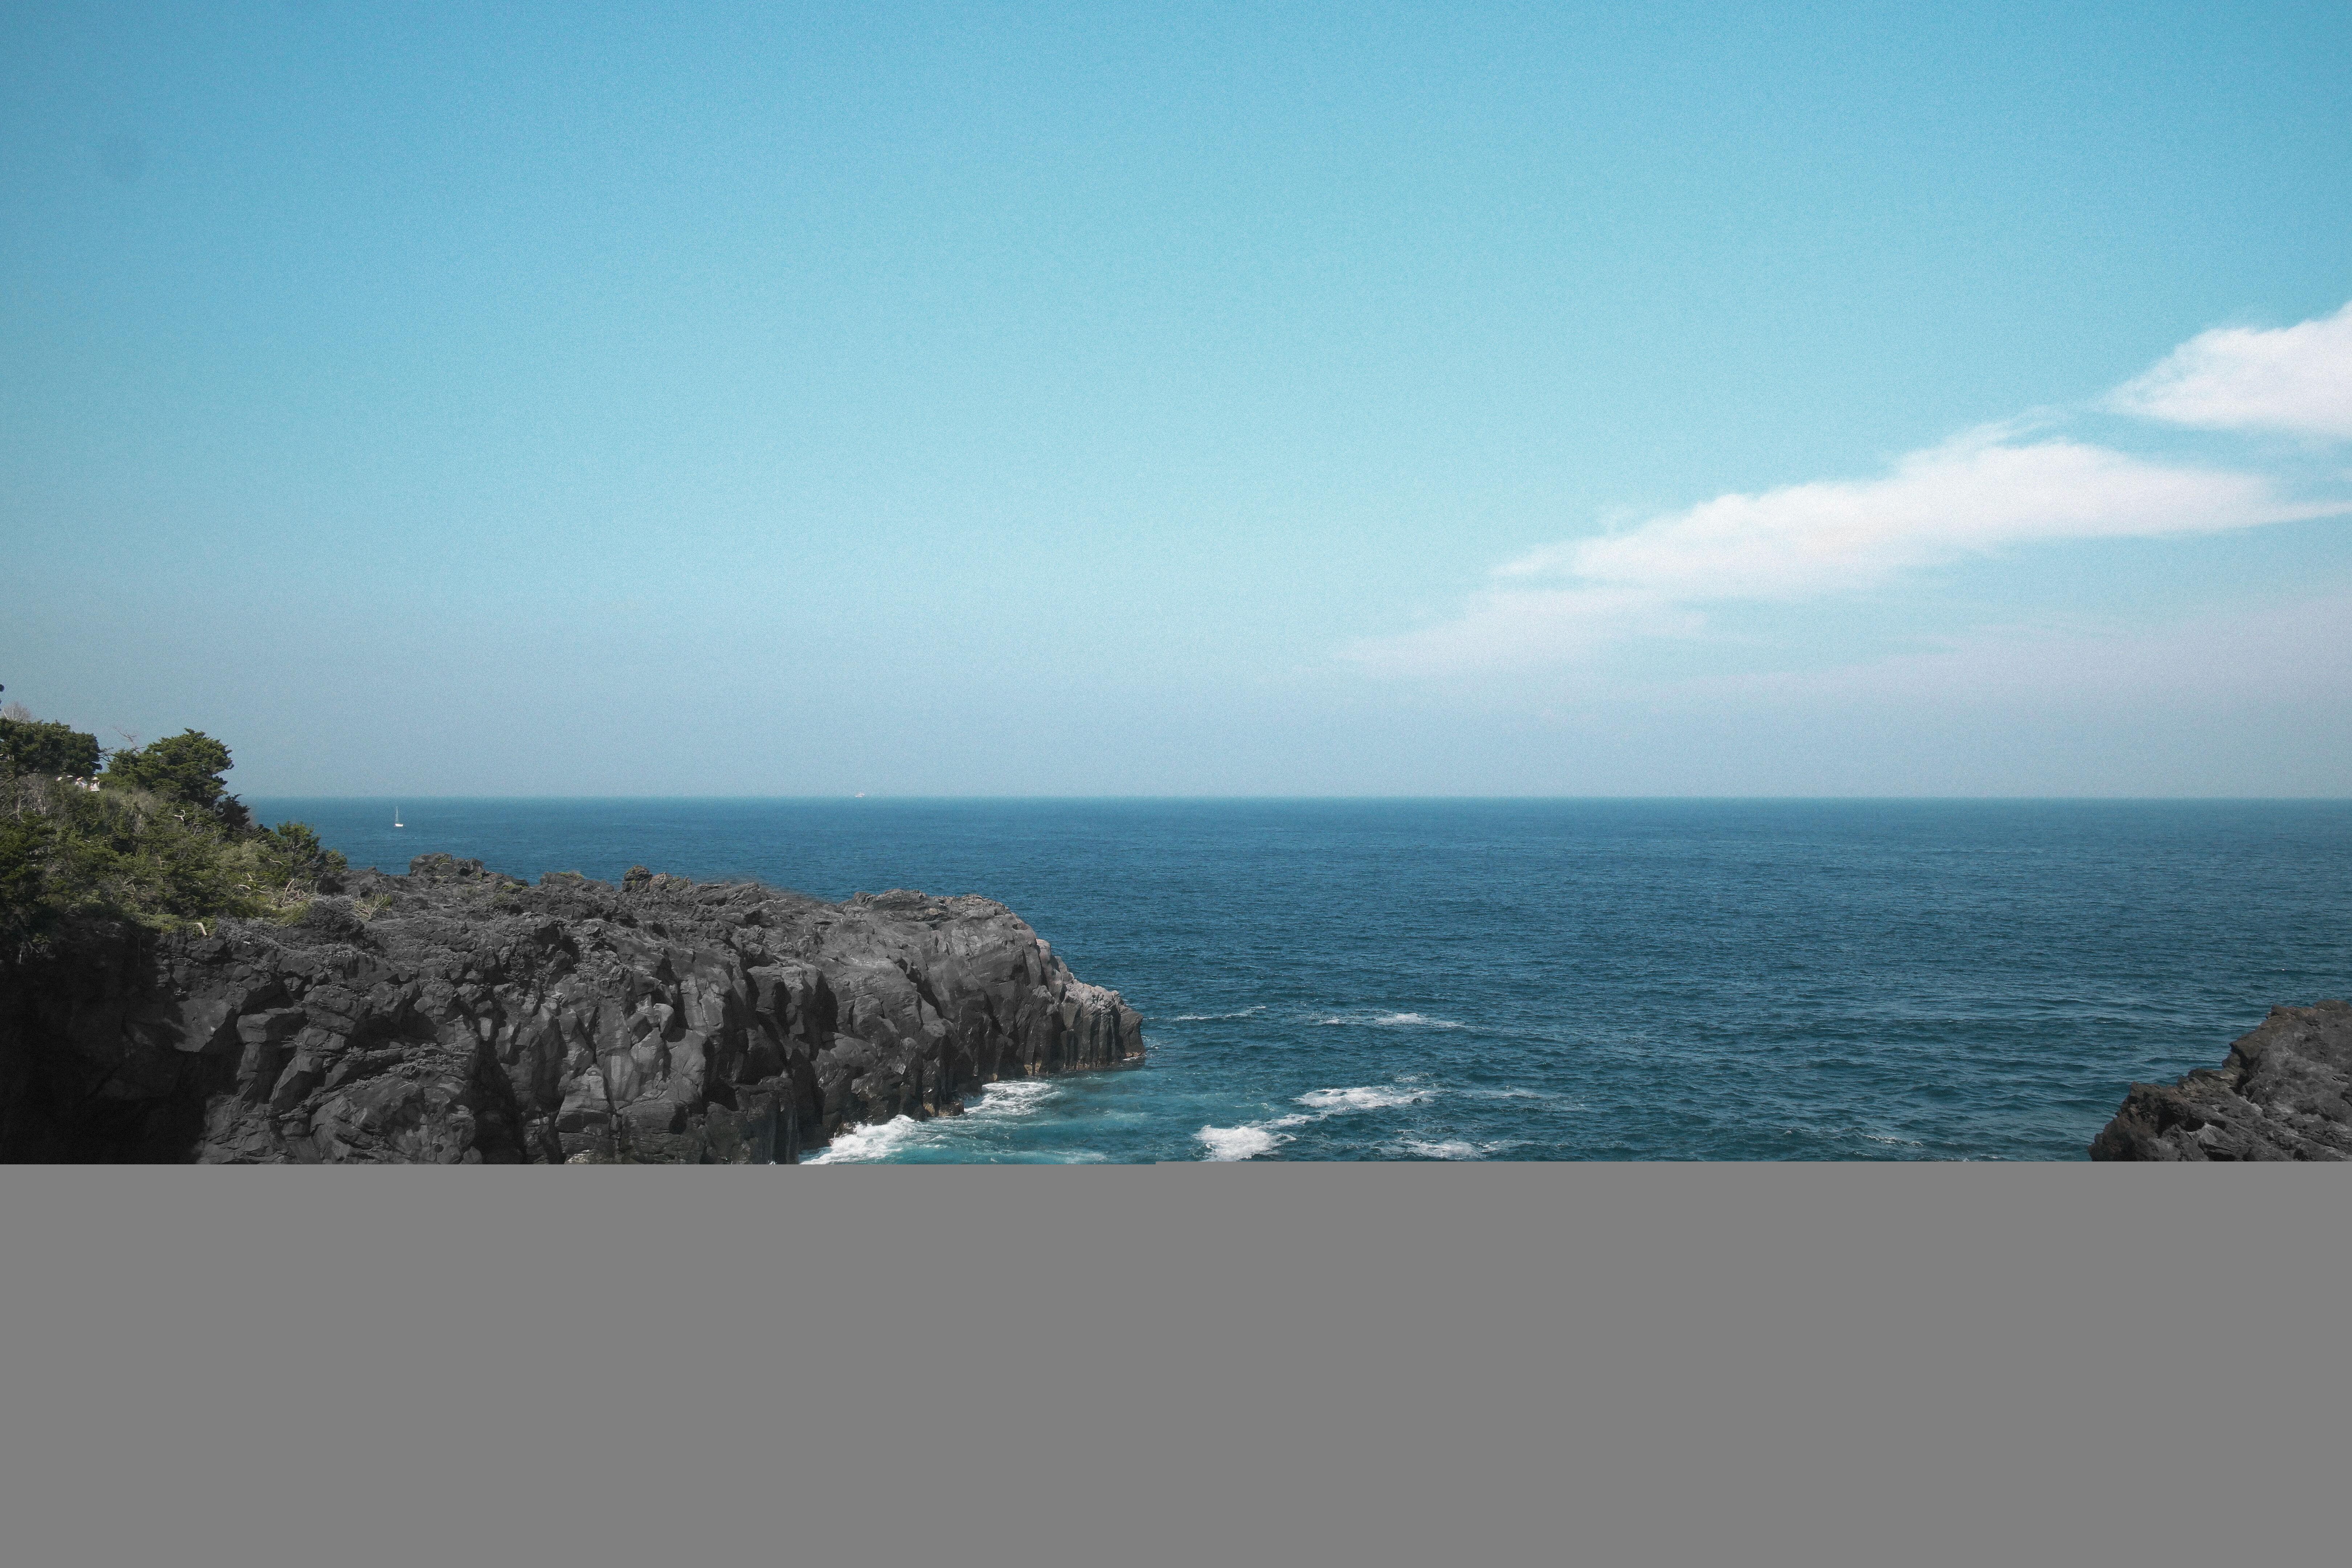 Gambar : alam, batu, lautan, horison, langit, jurang, teluk